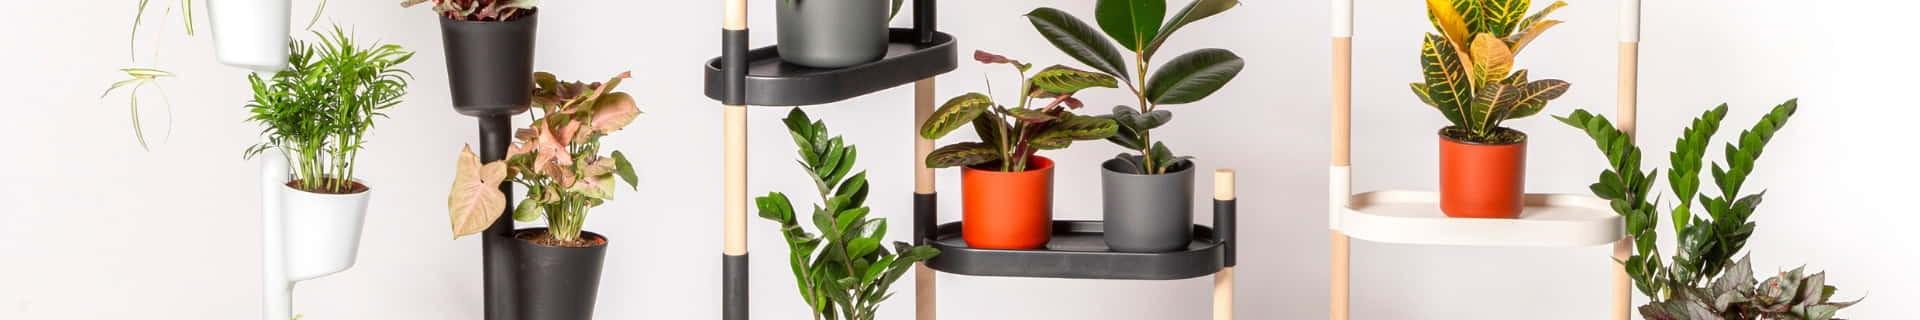 CitySens Bestseller Produkte:  vertikaler Blumentopf, Blumenregal und Wand-Blumentopf.